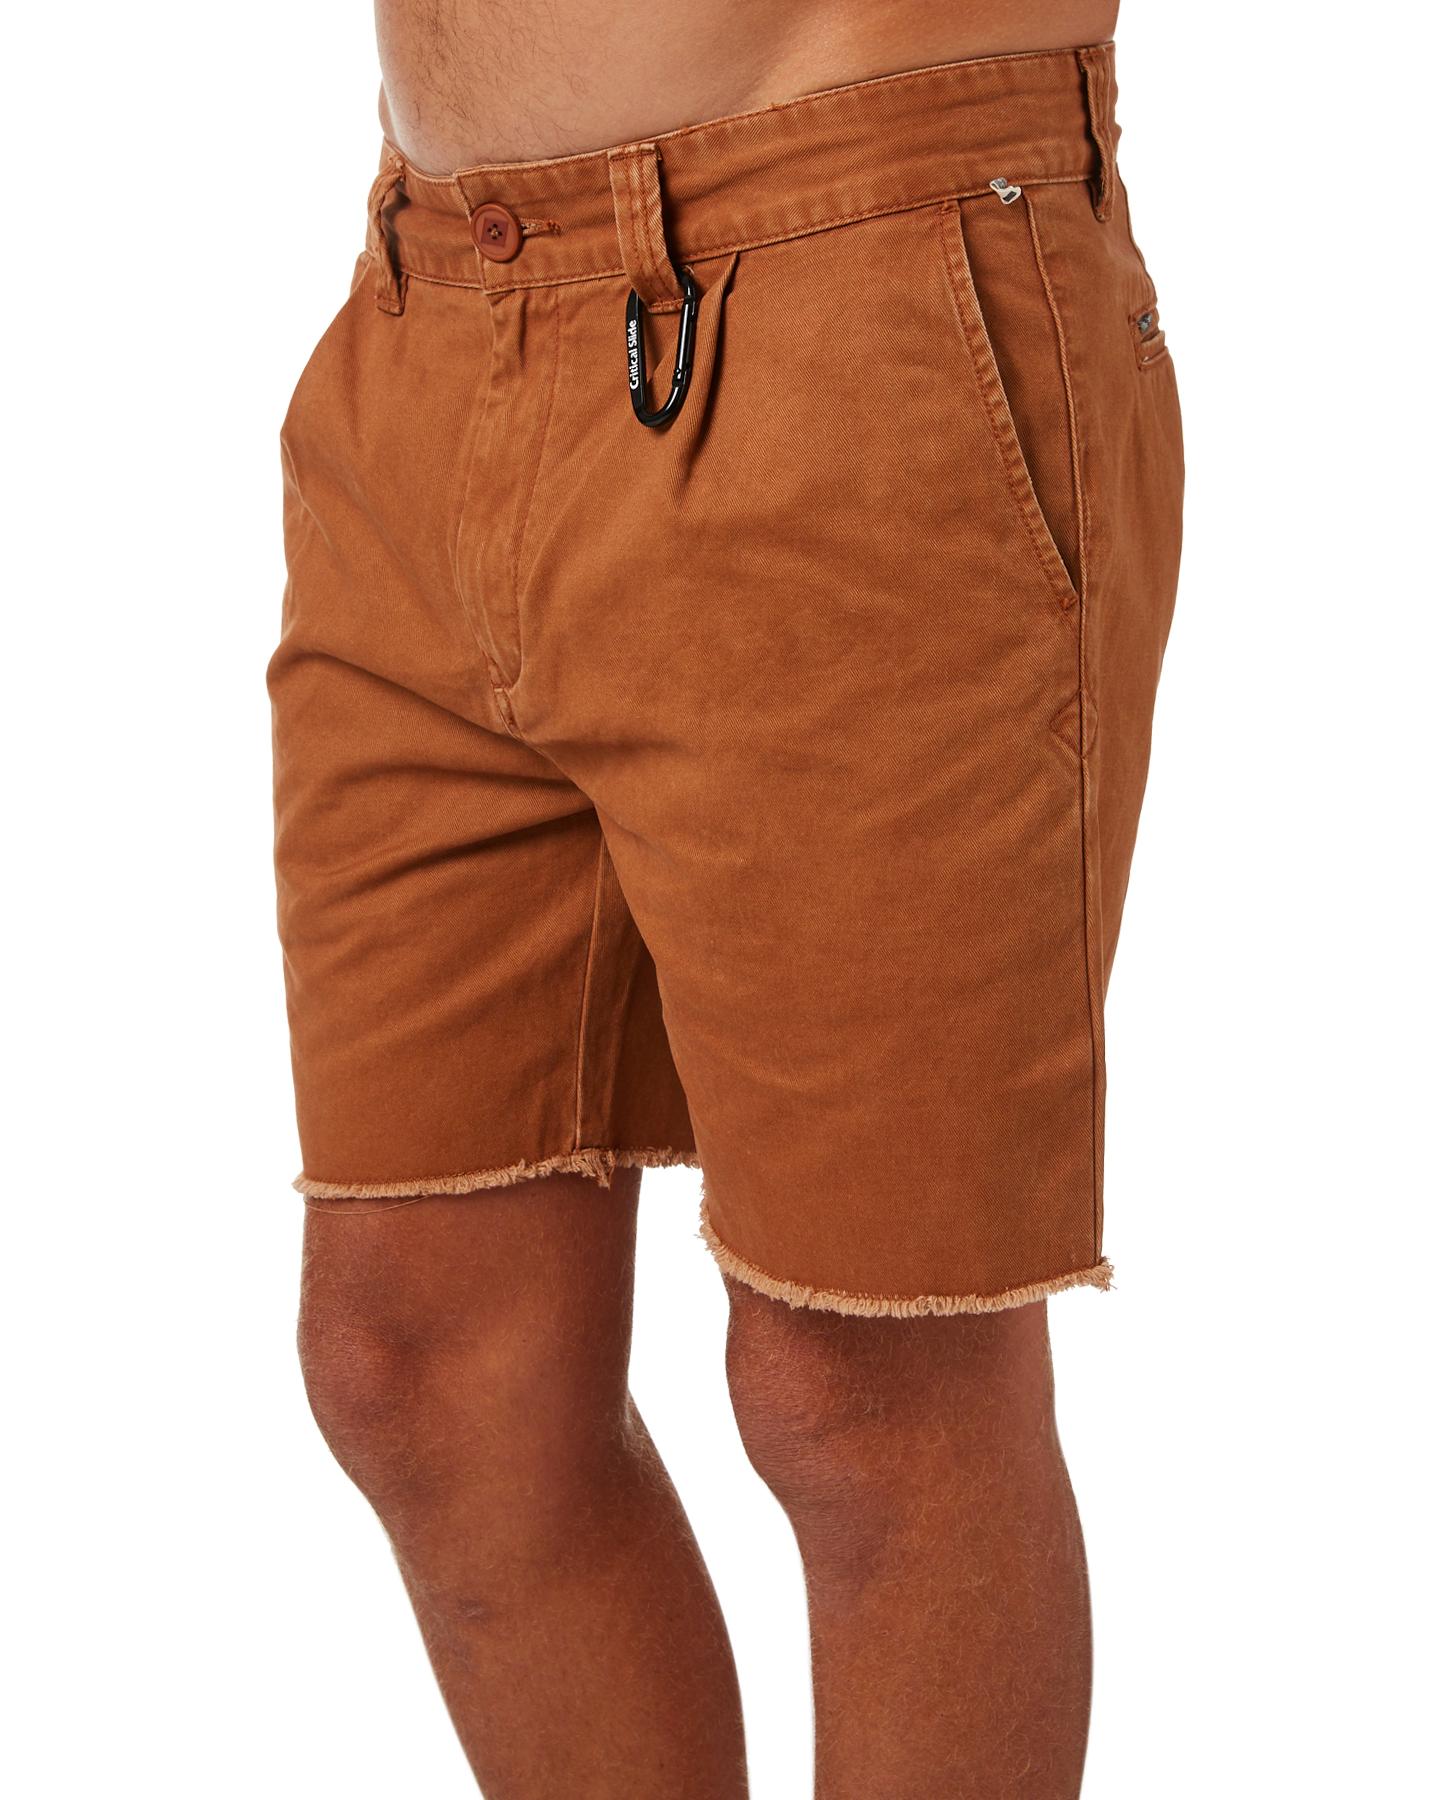 New-The-Critical-Slide-Society-Men-039-s-Beachnik-Mens-Short-Cotton-Fitted-Brown